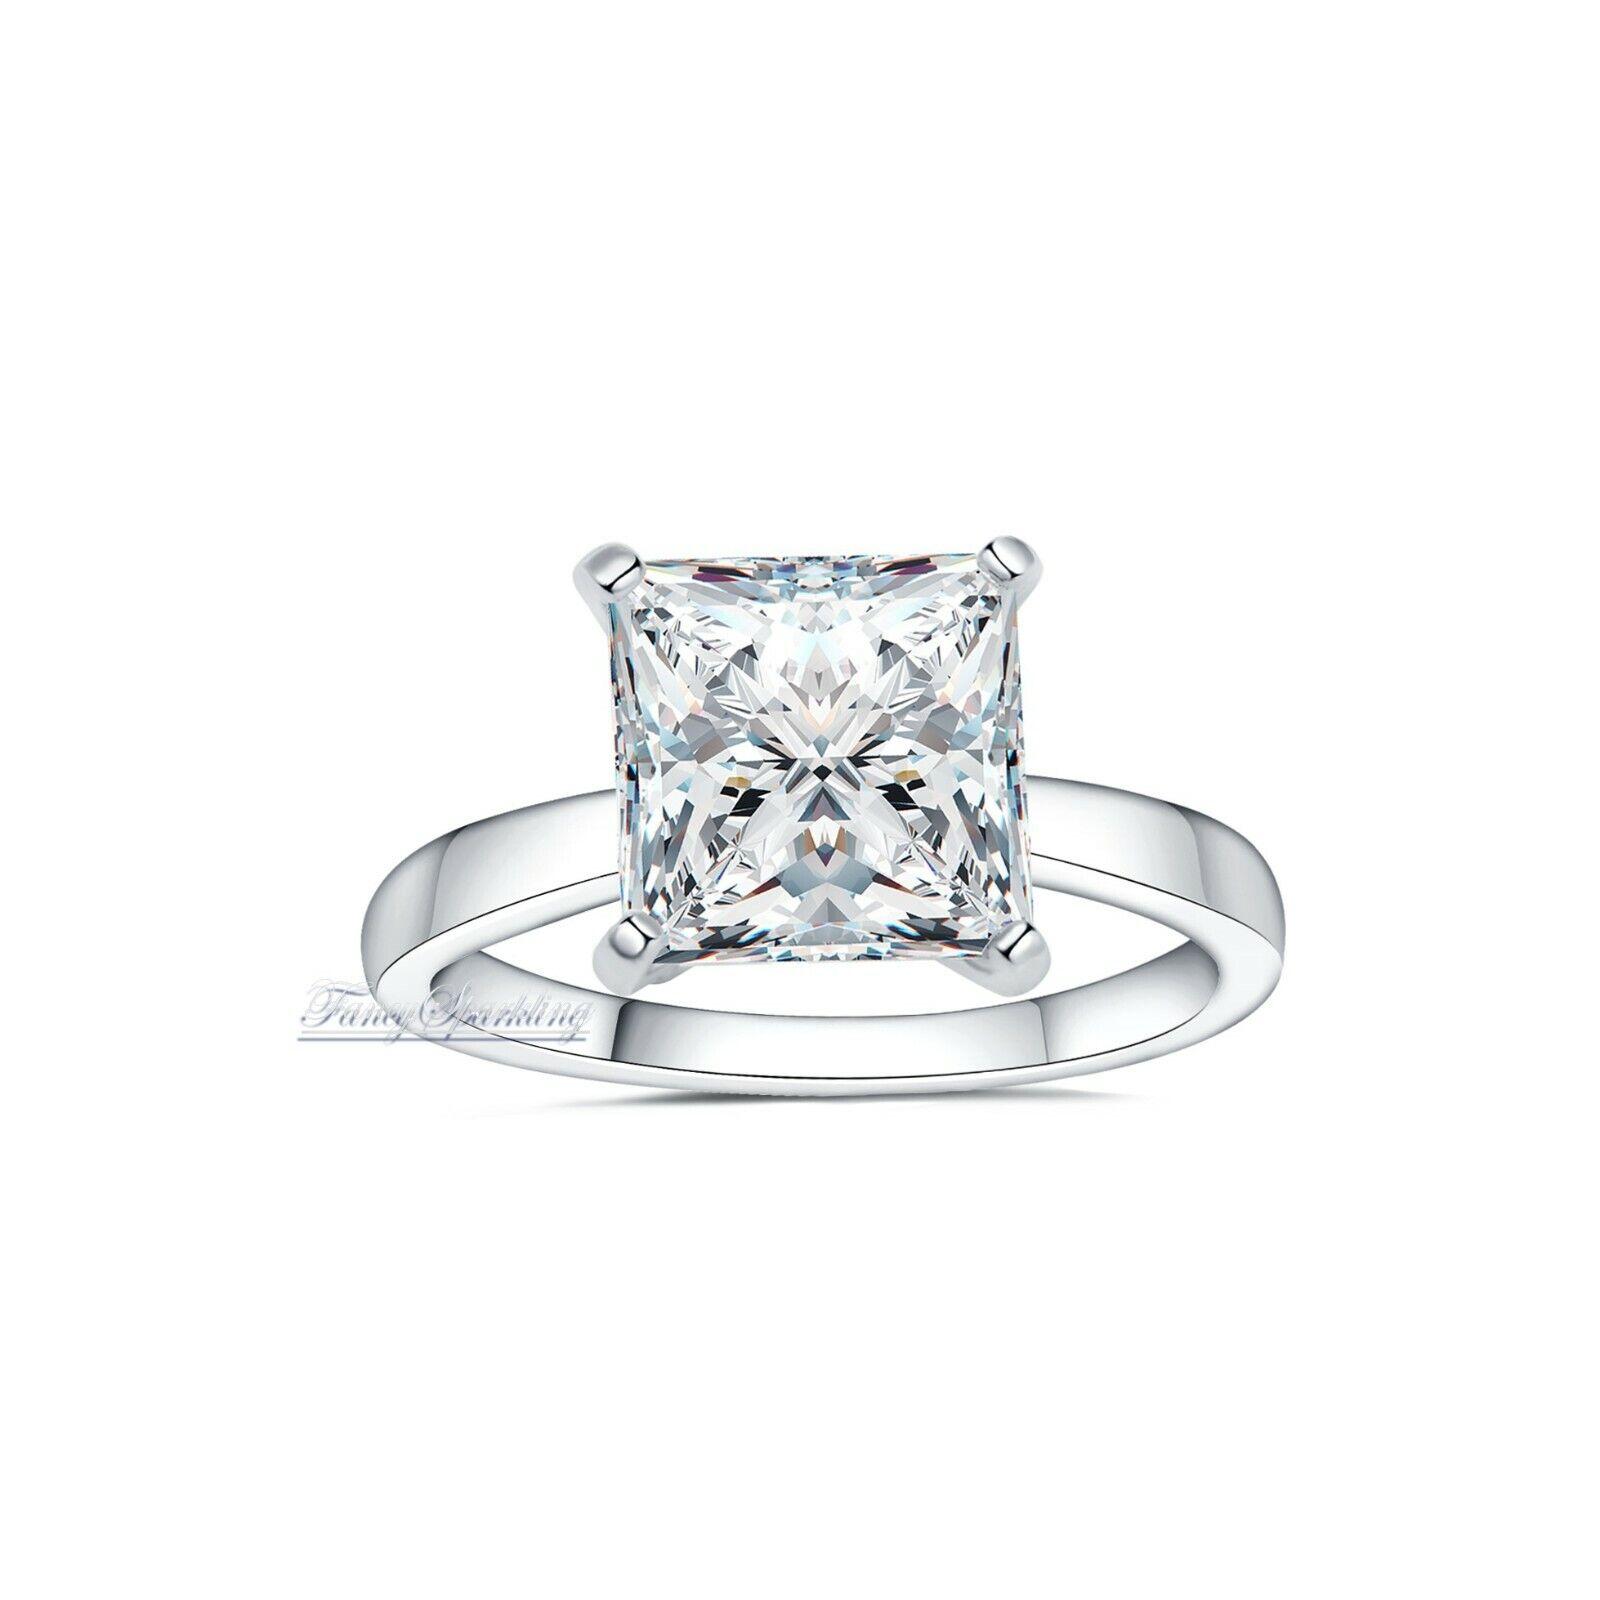 5 Ct Womens Diamond Engagement Ring in 14K White Gold Over Diamond ring